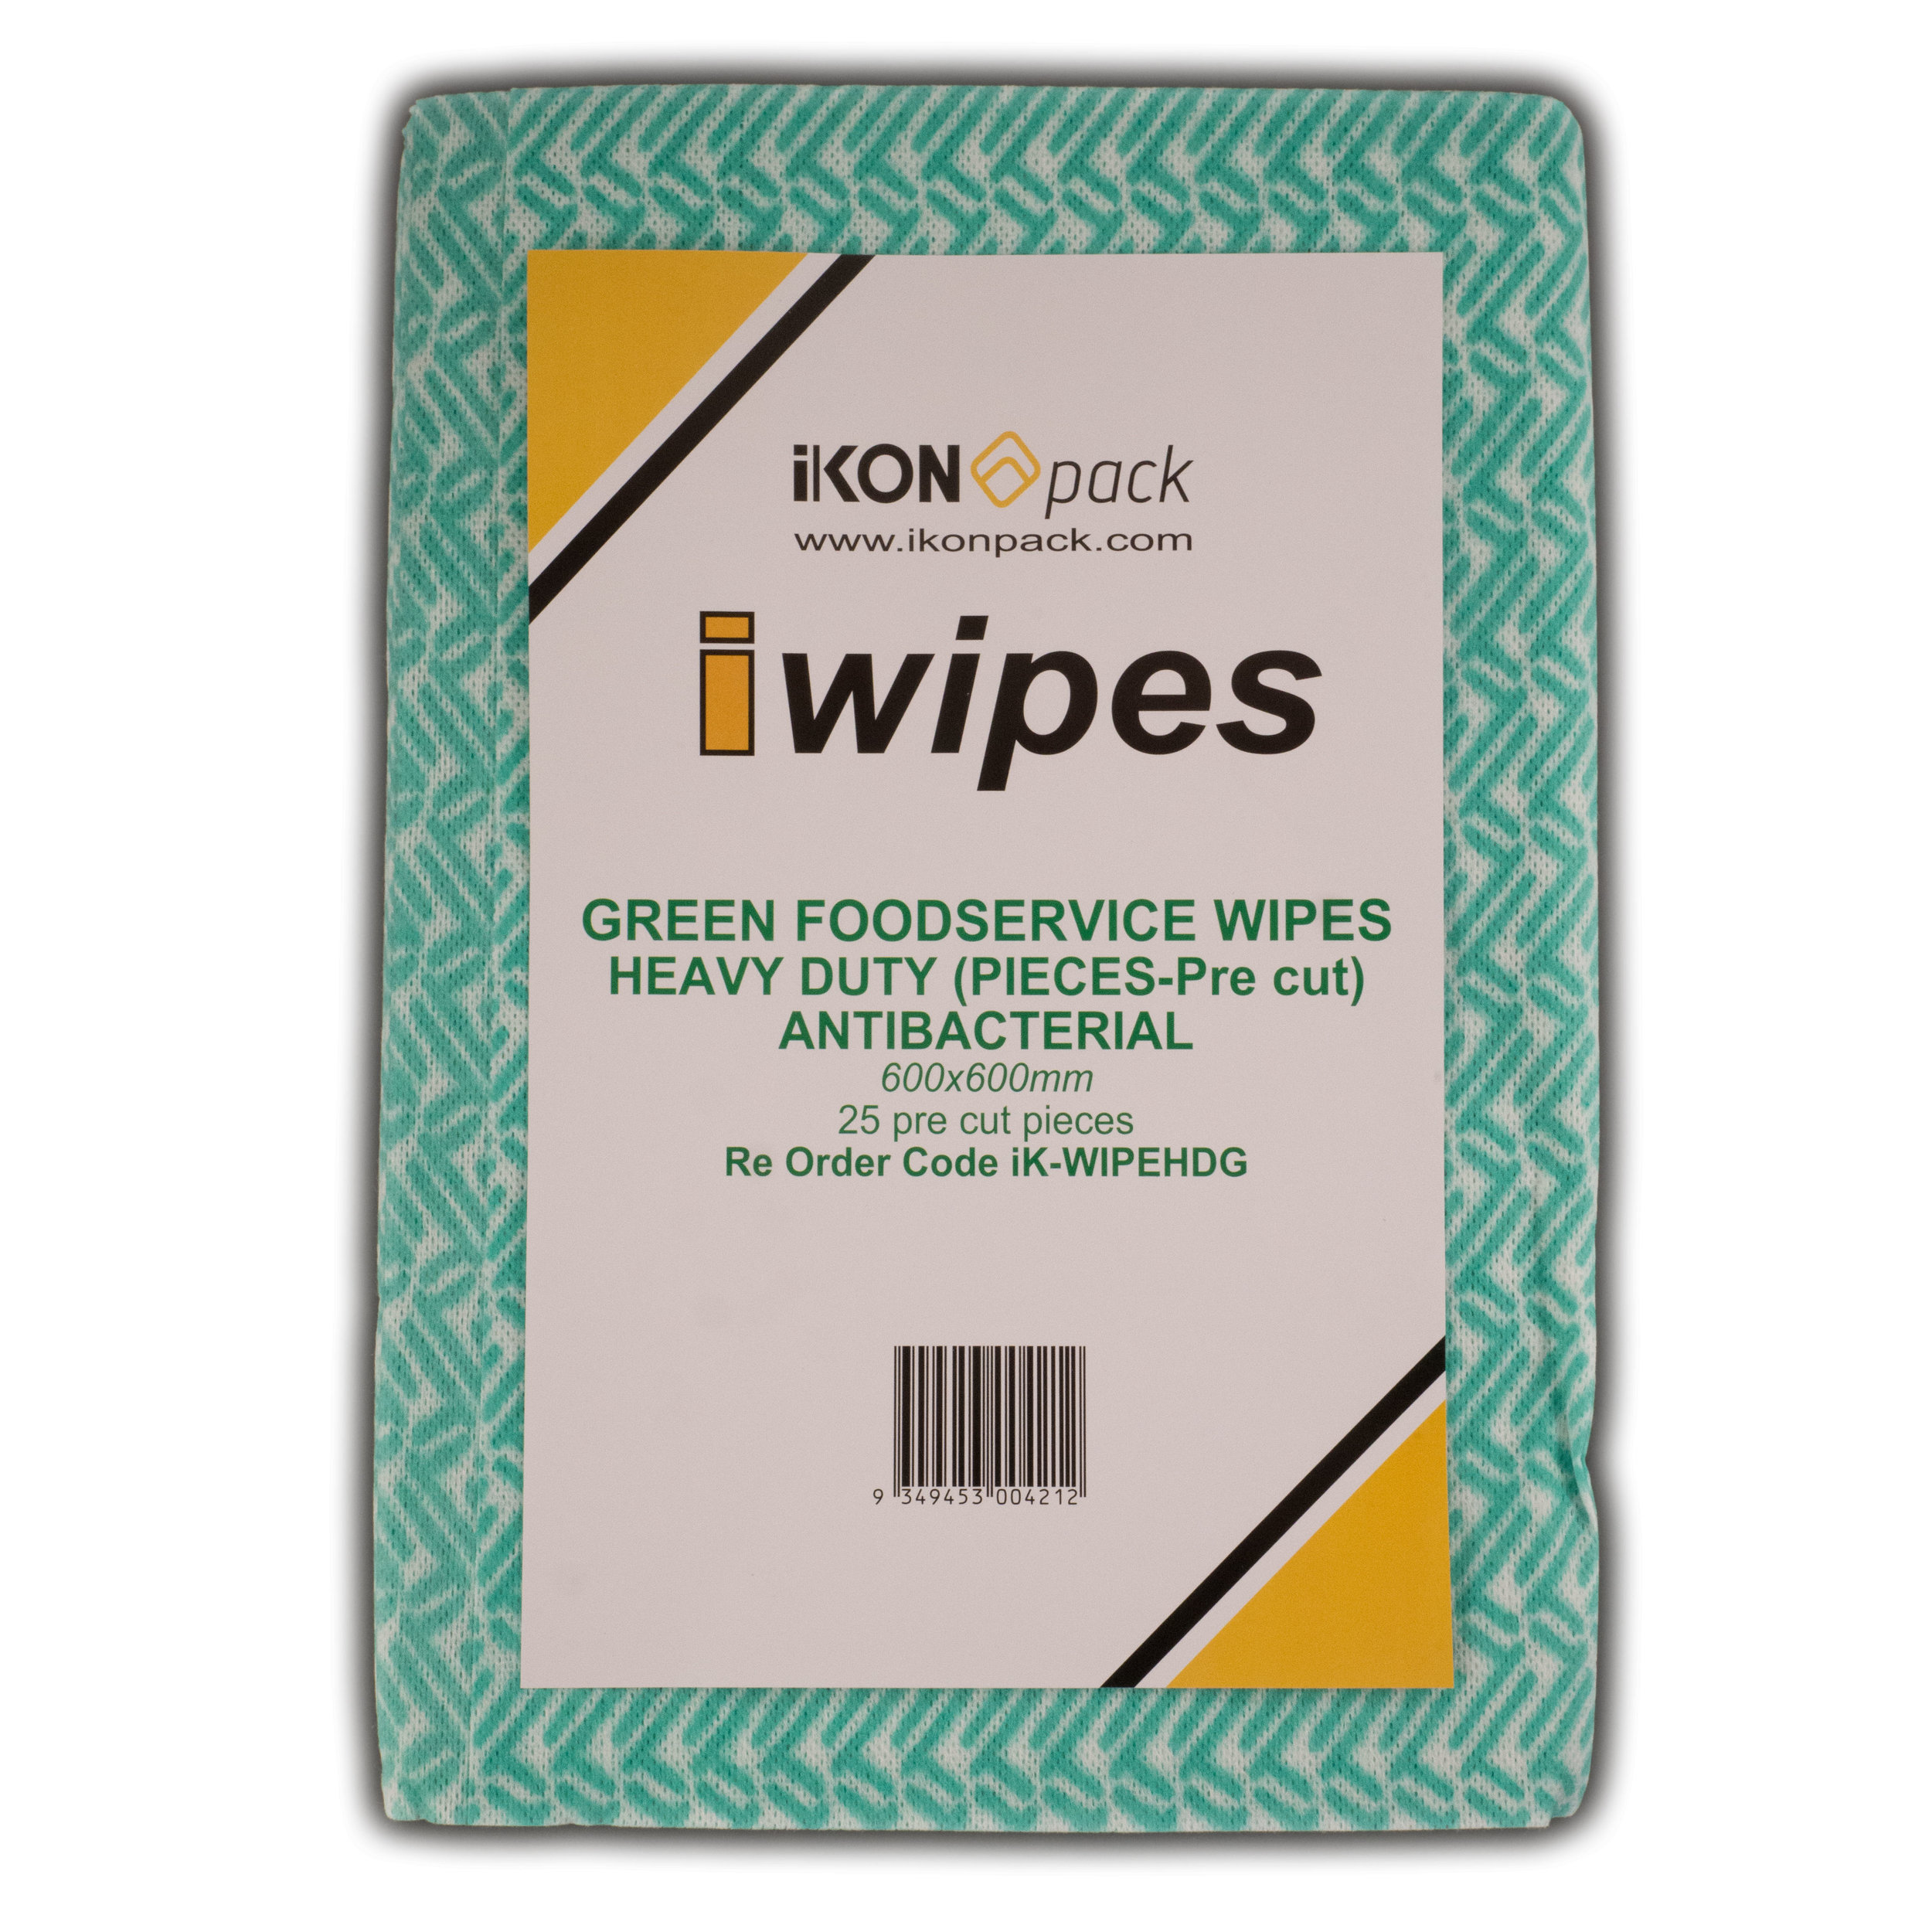 iK-WIPEHDG GREEN FOODSERVICE WIPES HEAVY DUTY (PIECES-Pre cut)   600x600mm Pre Cut Pieces      25 per pack 100 per box